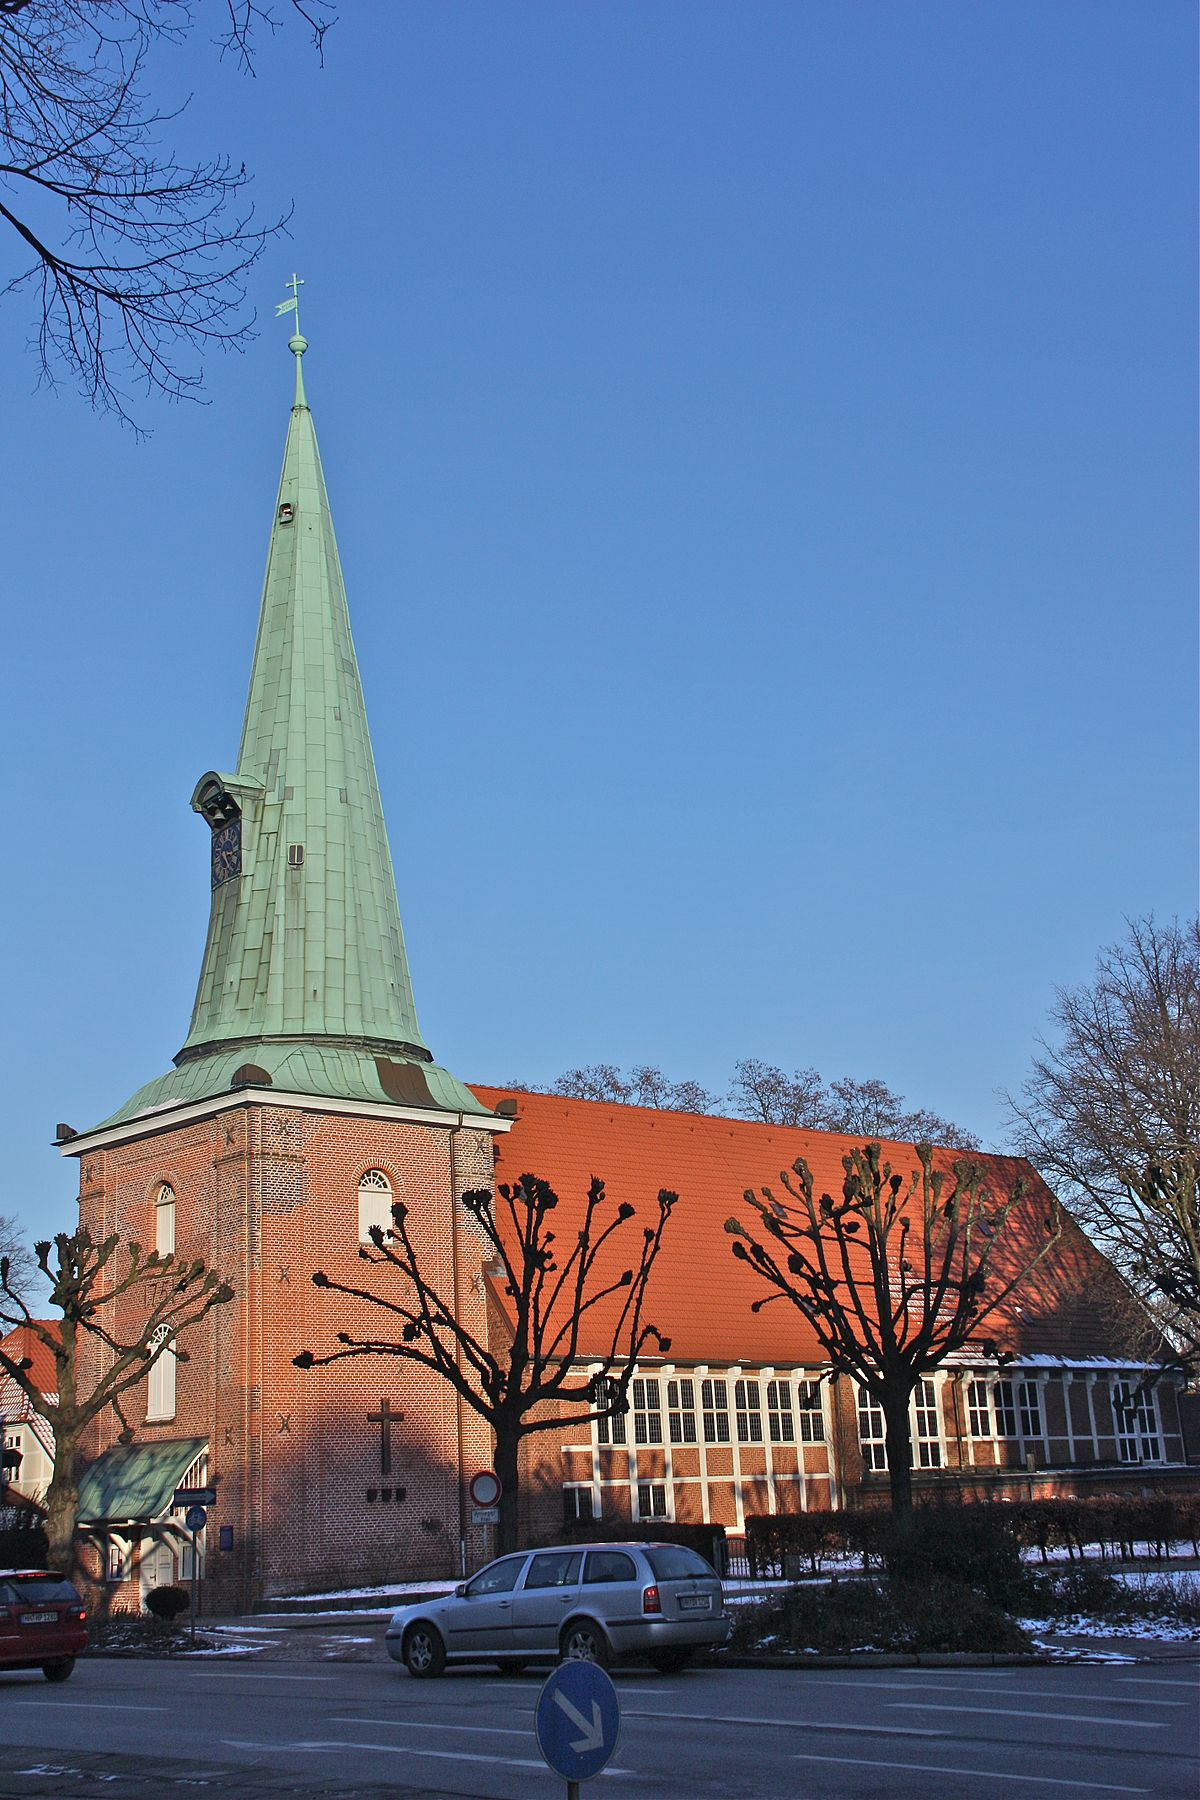 St Johannis Eppendorf